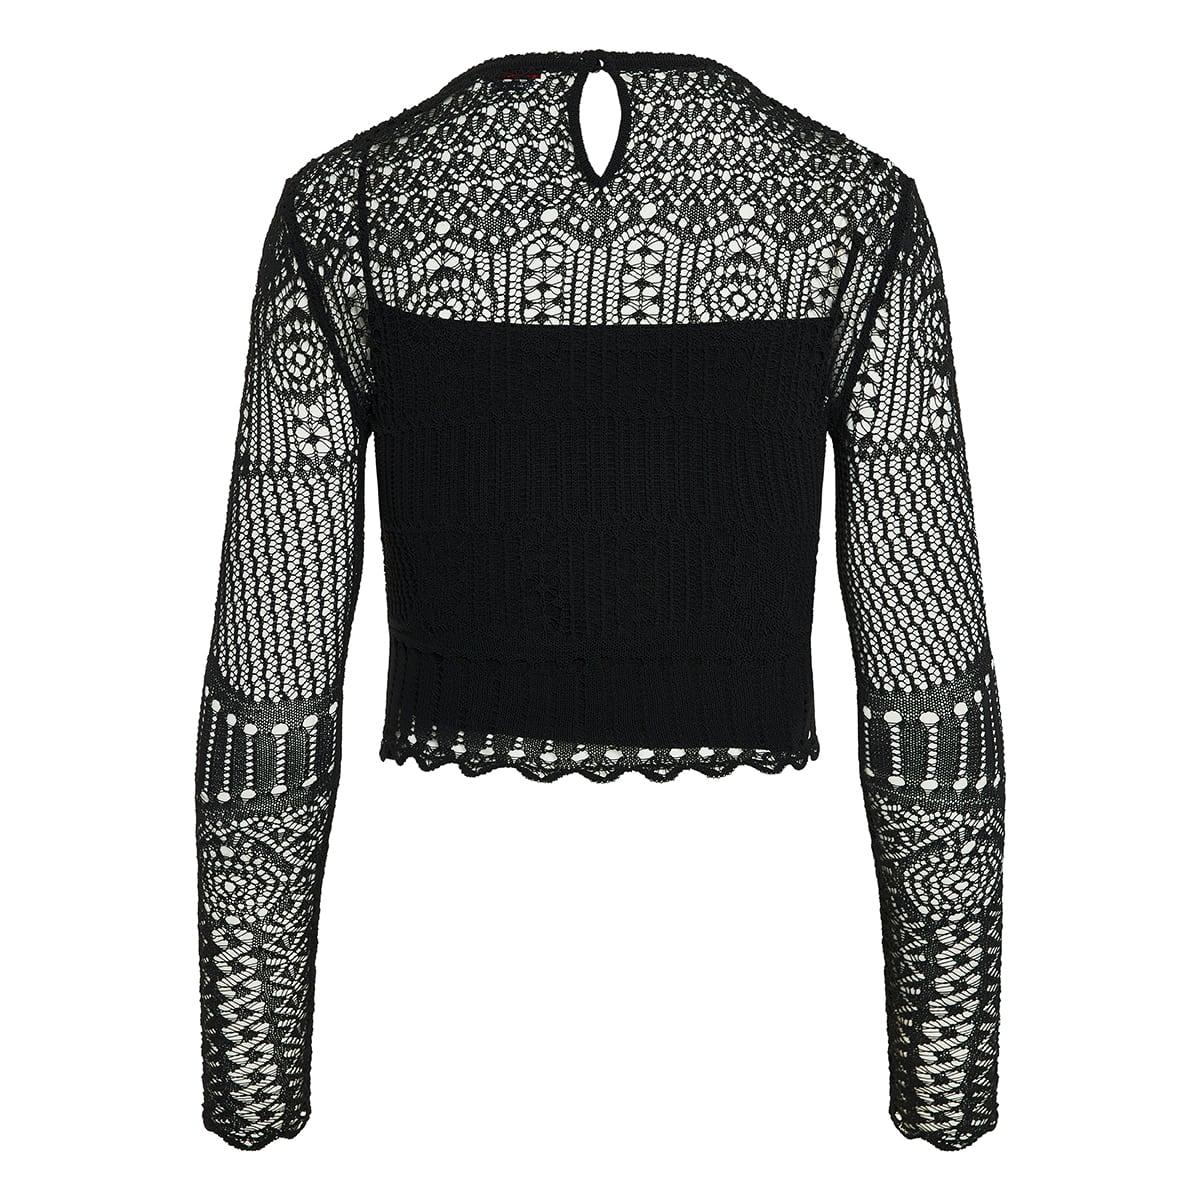 Crochet-knit cropped top